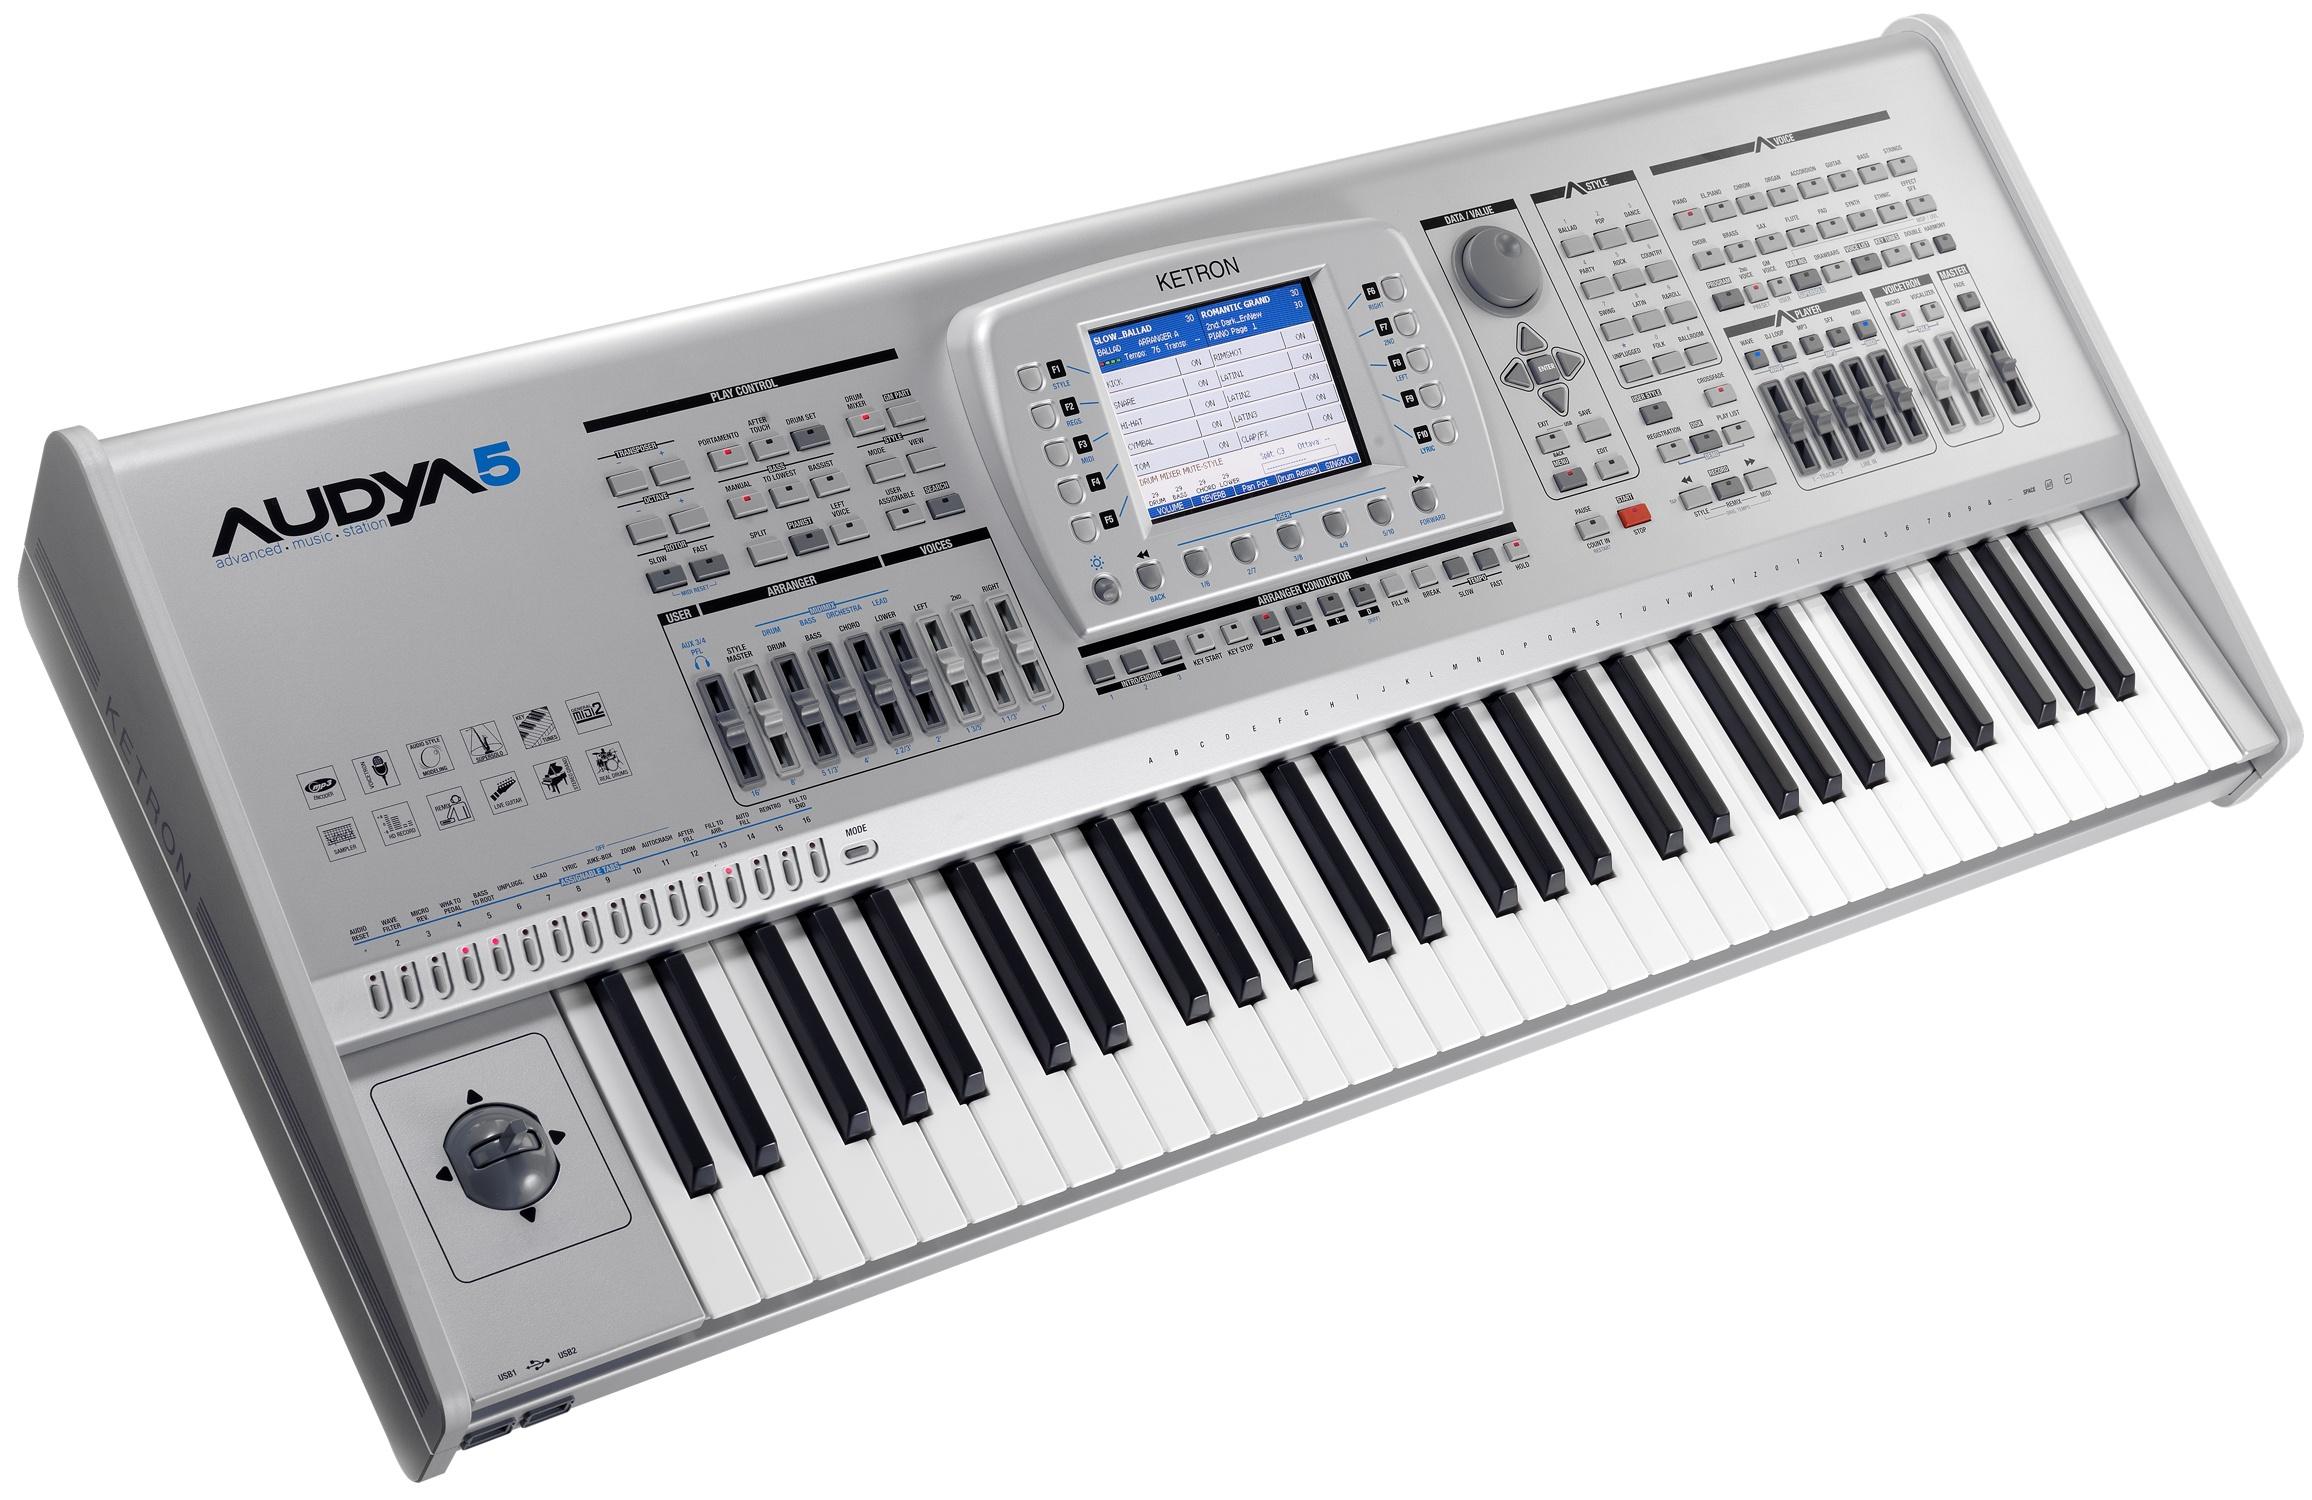 ketron audya 5 arranger keyboard factory refurbished direct from ketron uk ebay